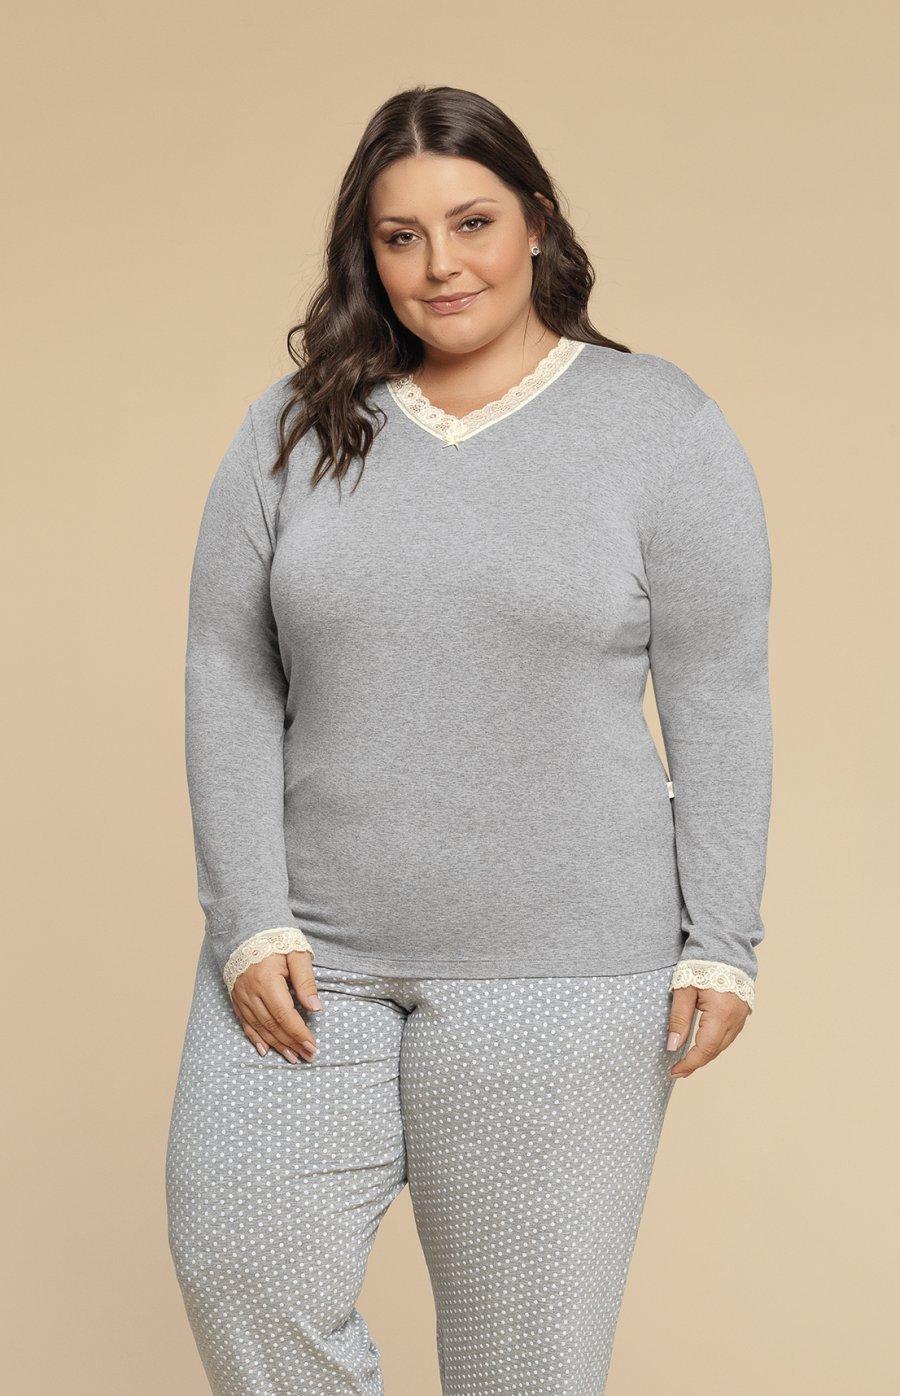 Pijama Plus Size Viscolycra Inverno MdS